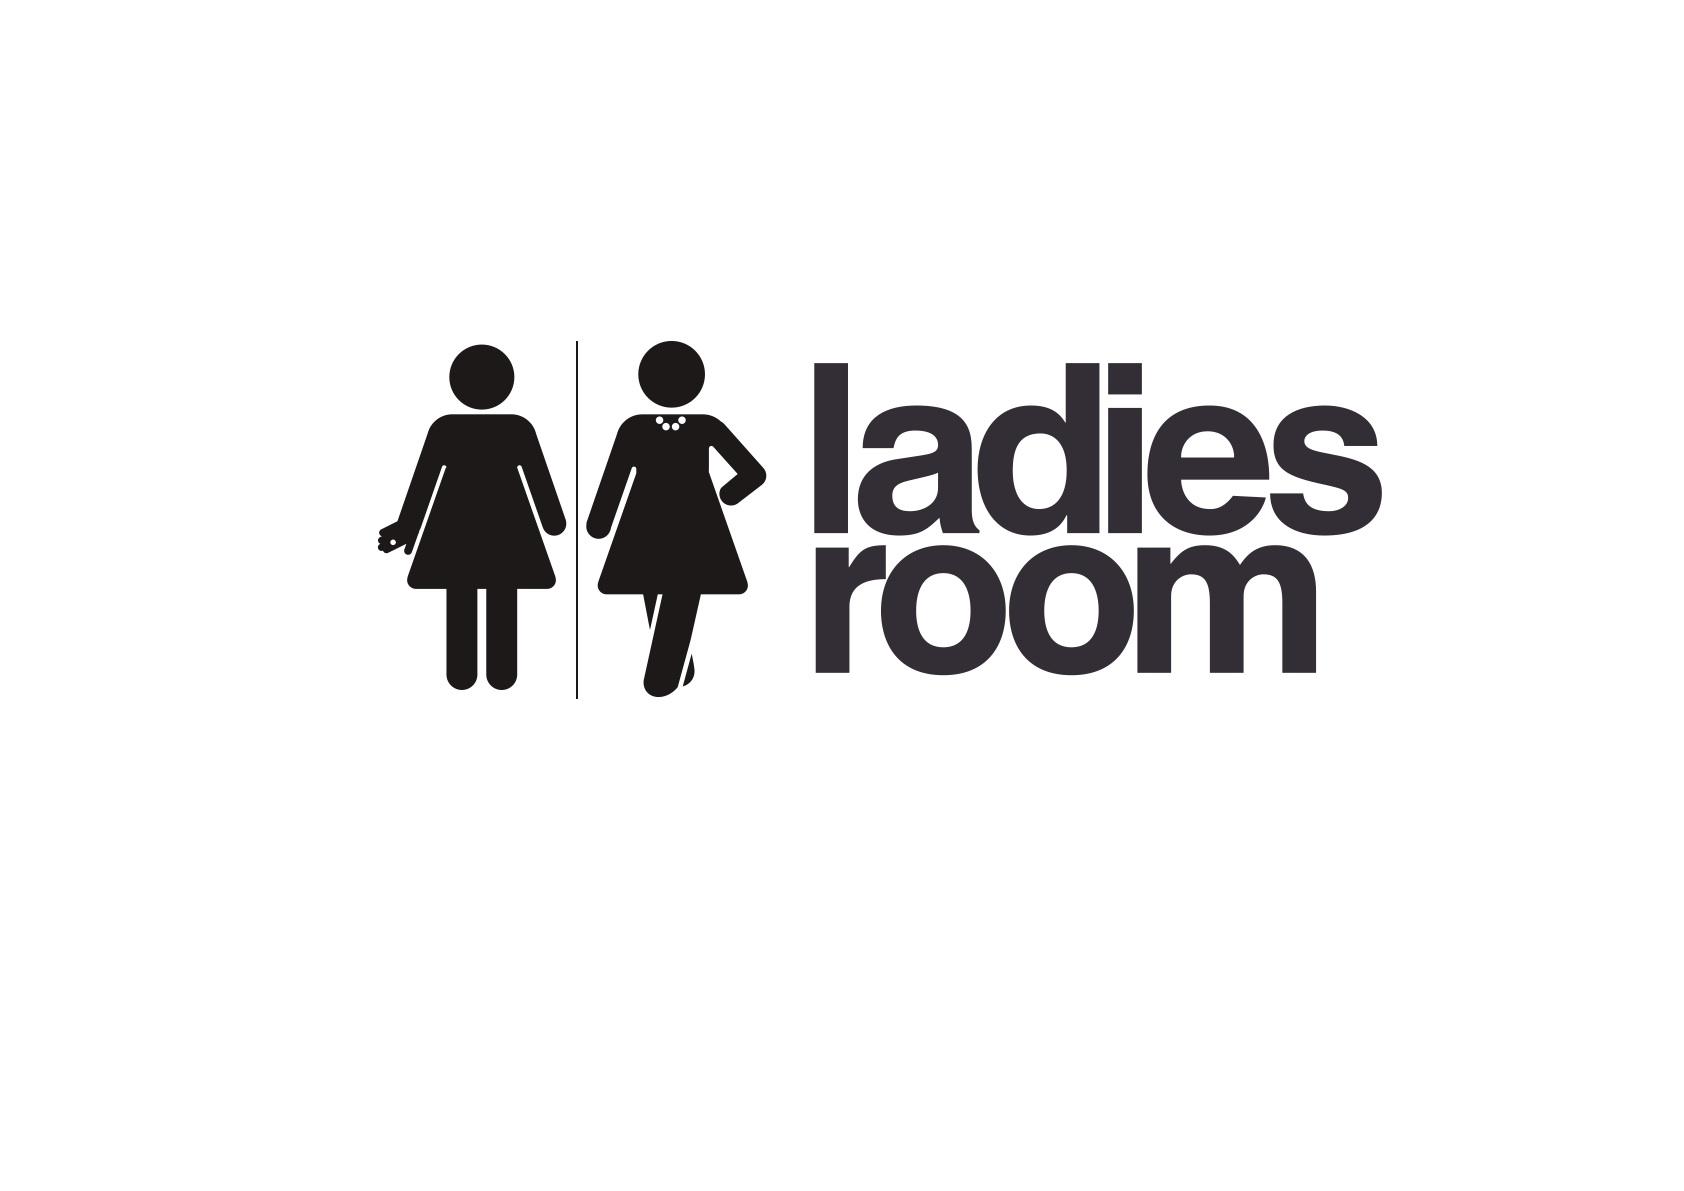 Les Ladies du vendredi, acte 2 !